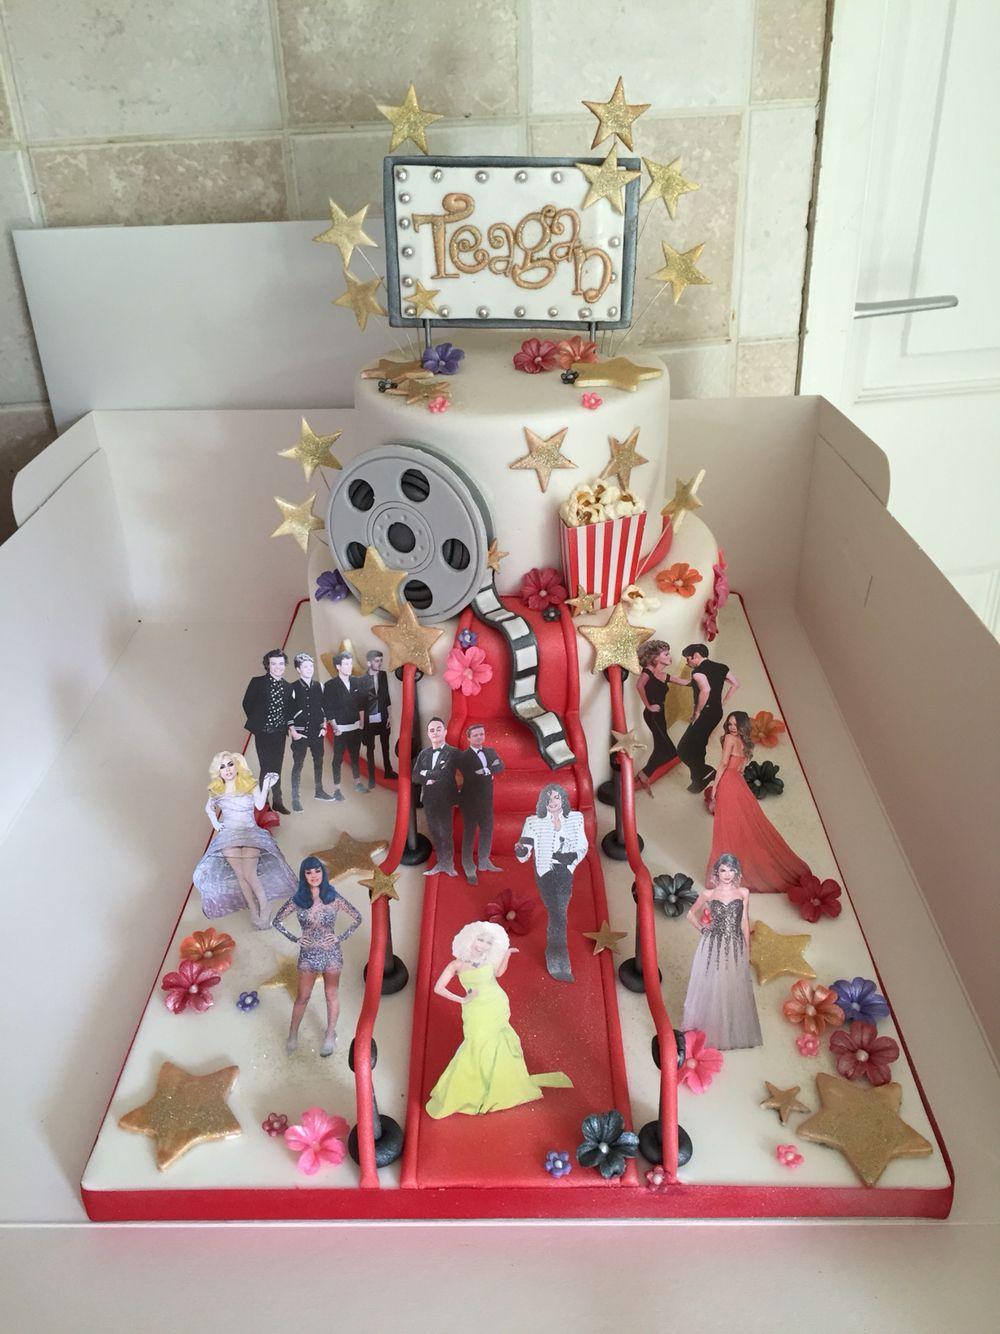 Hollywood celebrities cake holiday decor decor home decor